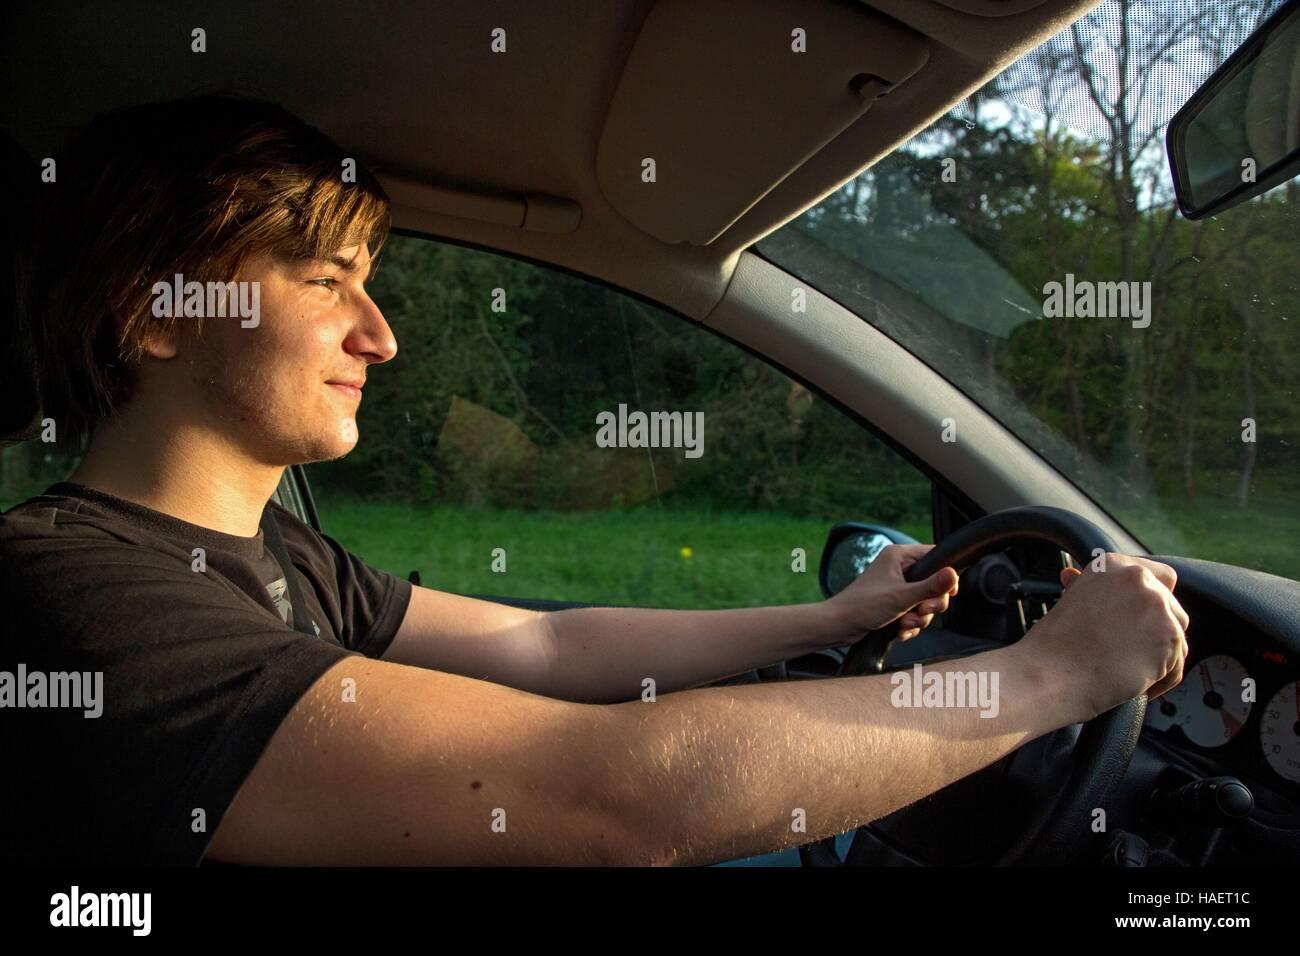 ACCOMPANIED DRIVING - Stock Image